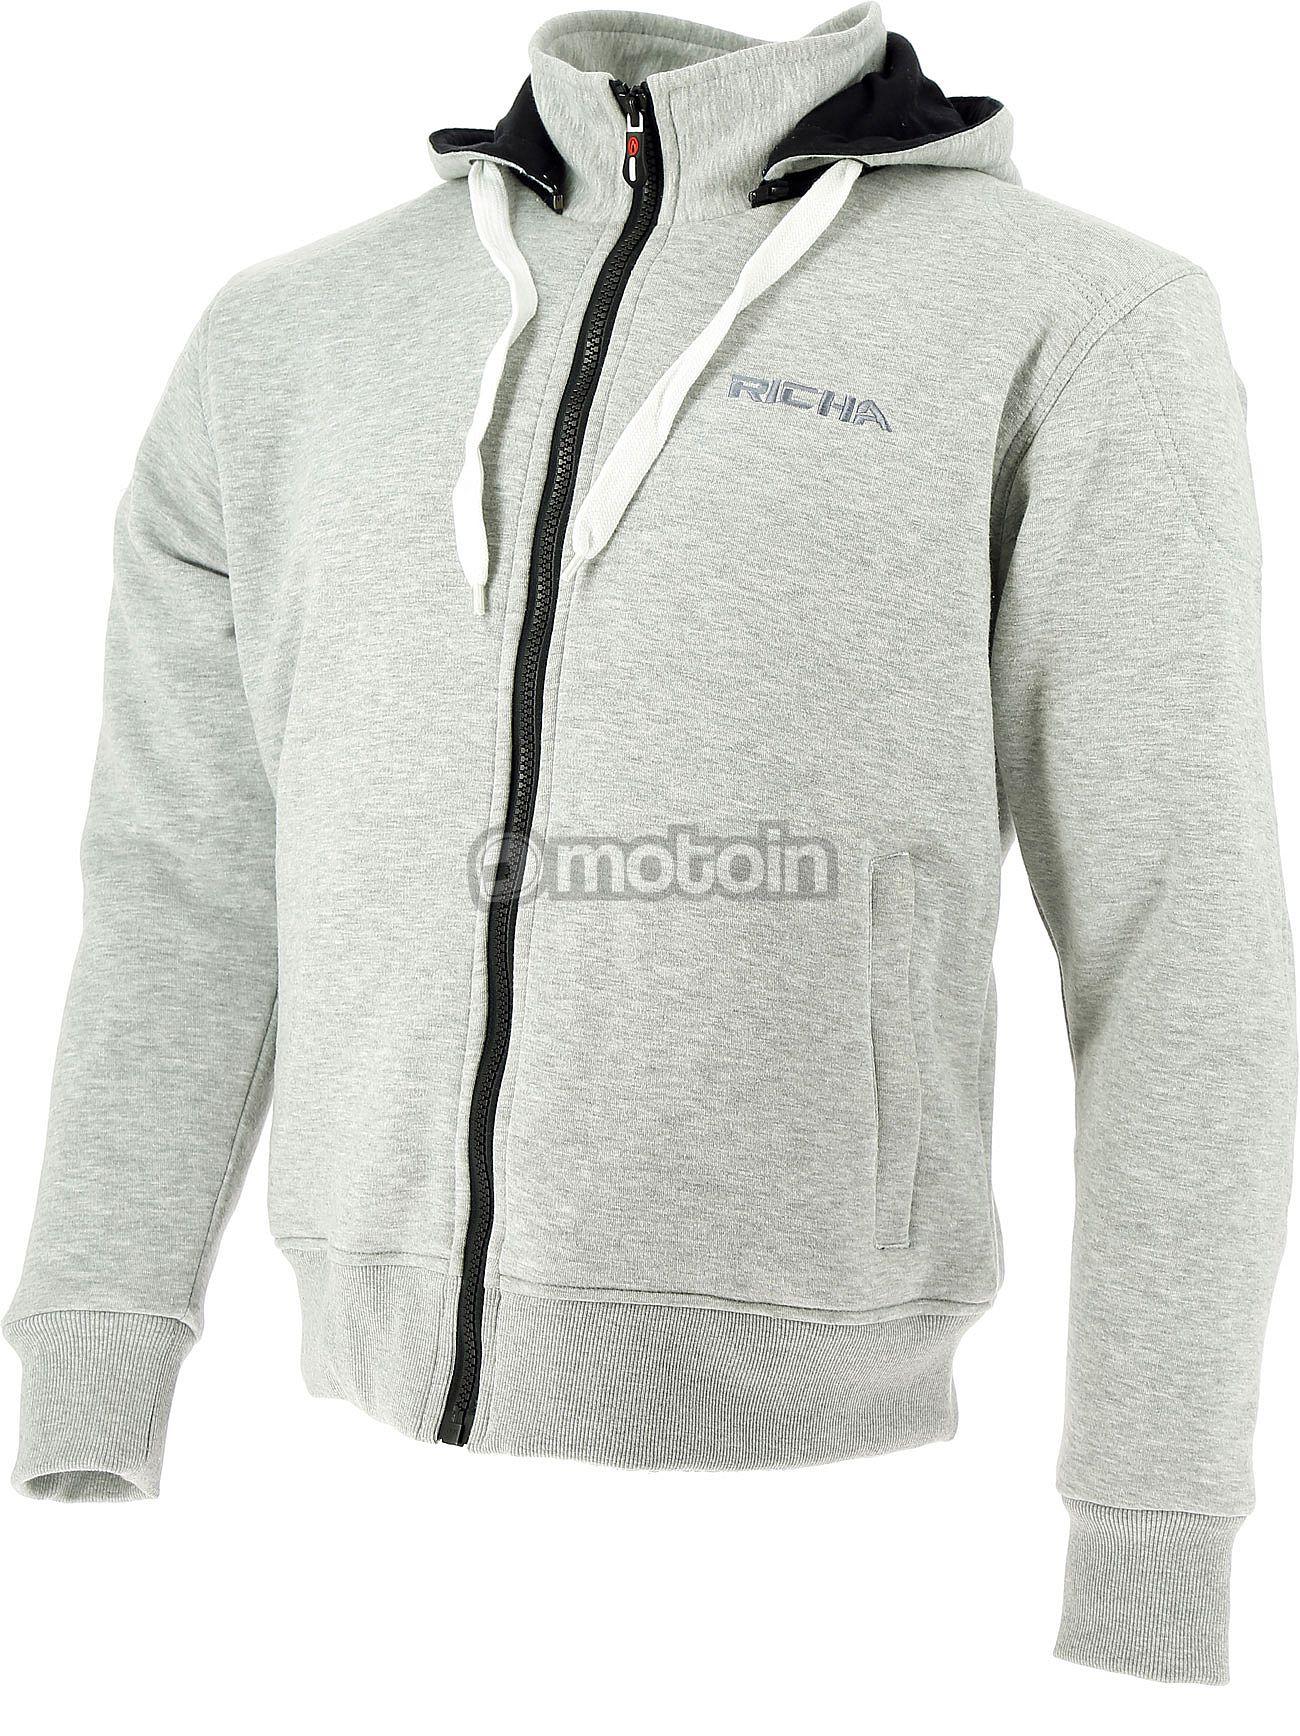 Macna Nuclone Moto Zip Hoodie Gris XL